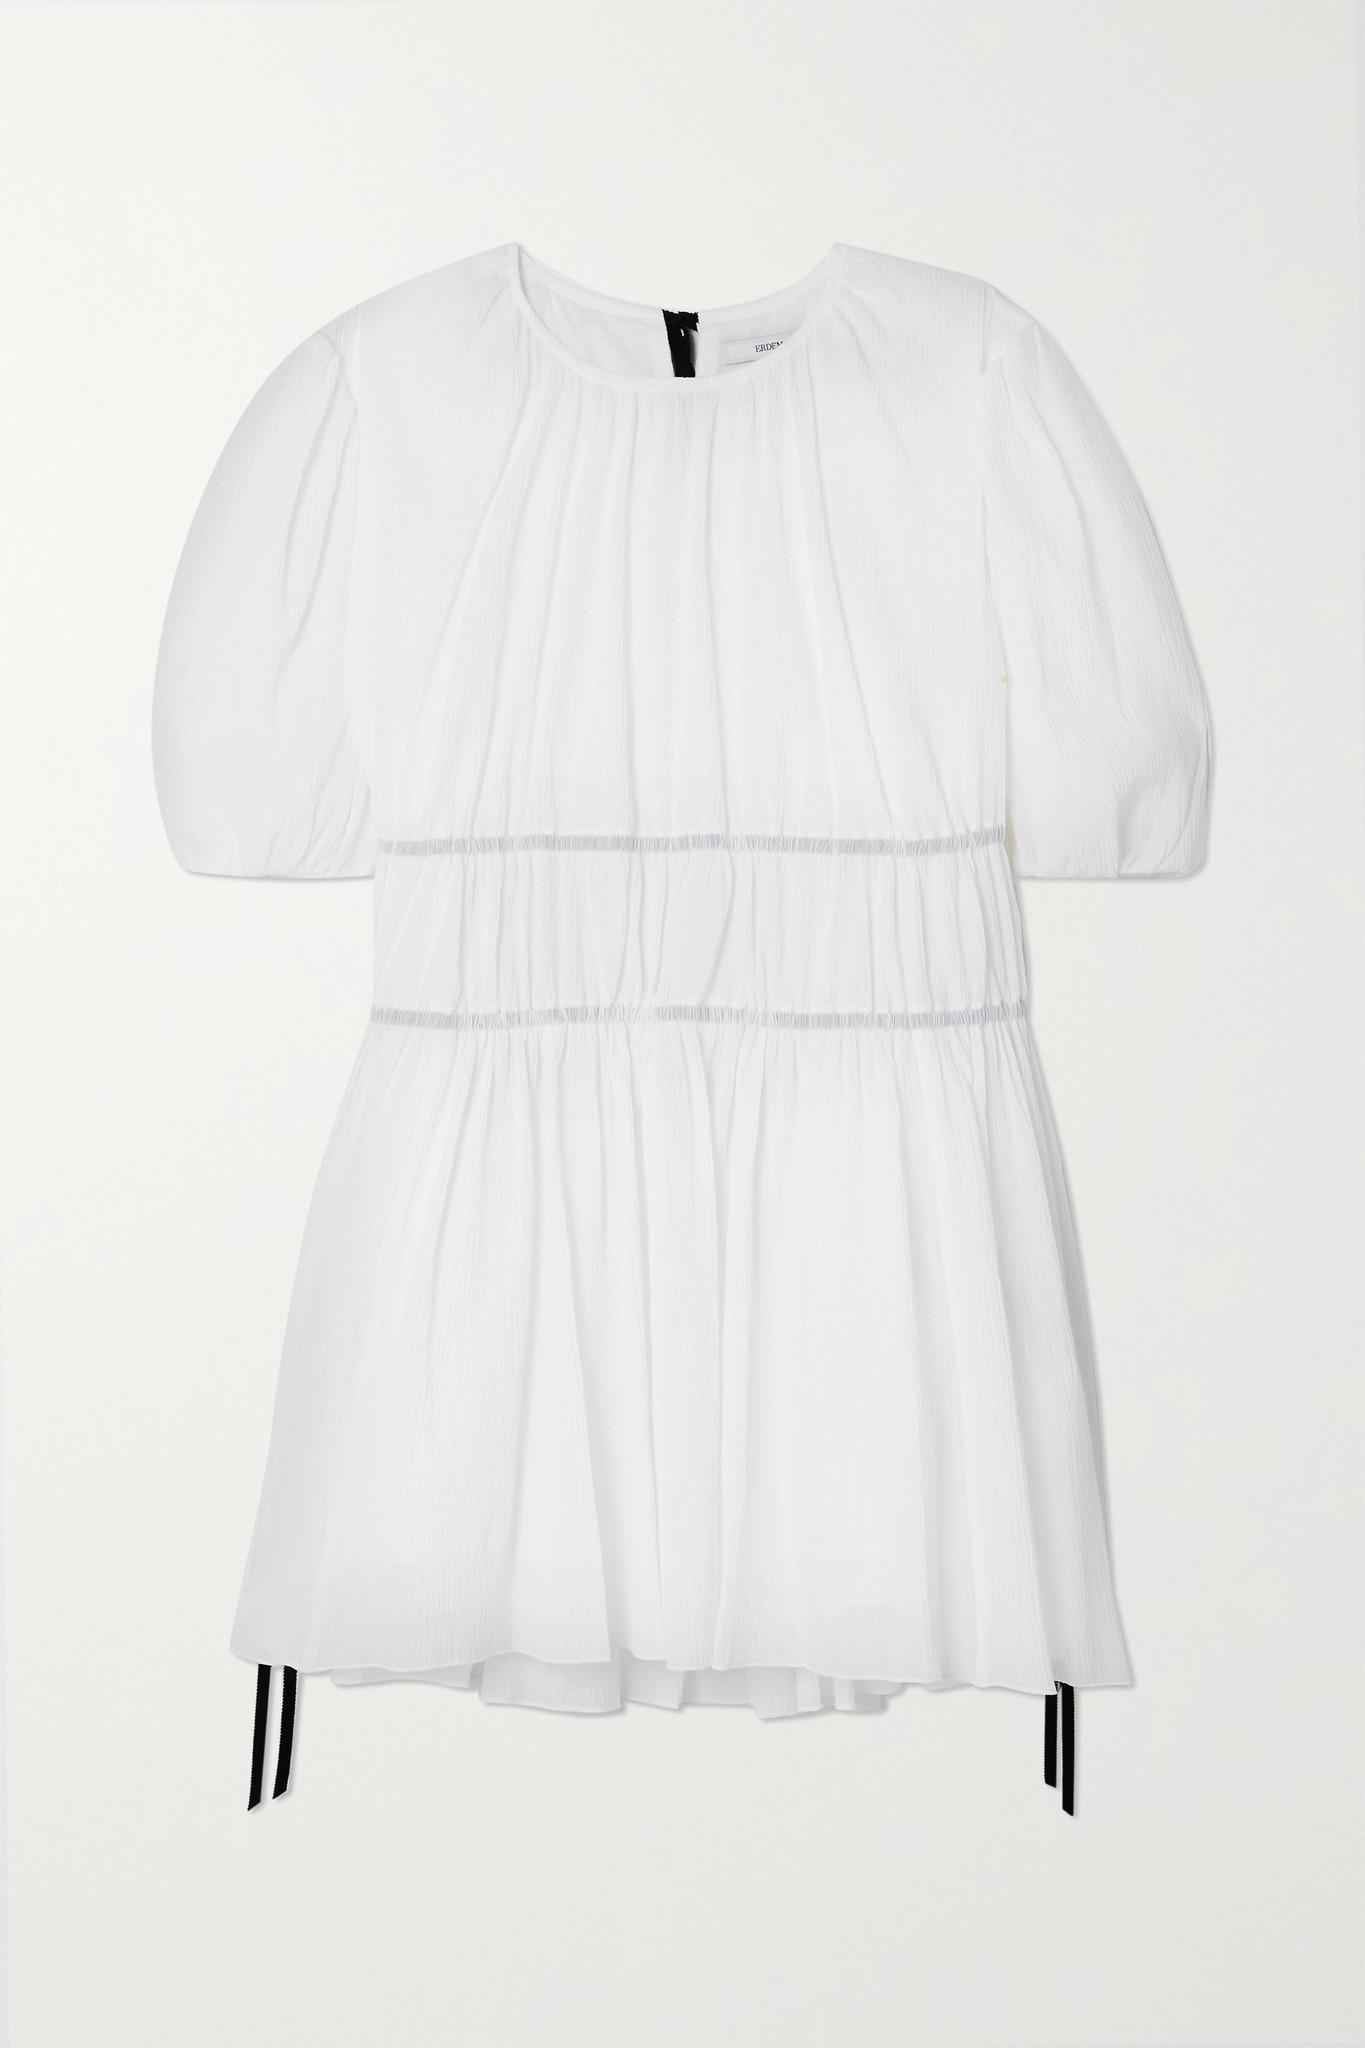 ERDEM - Lilwen 缩褶顺纡绉女衫 - 白色 - UK8